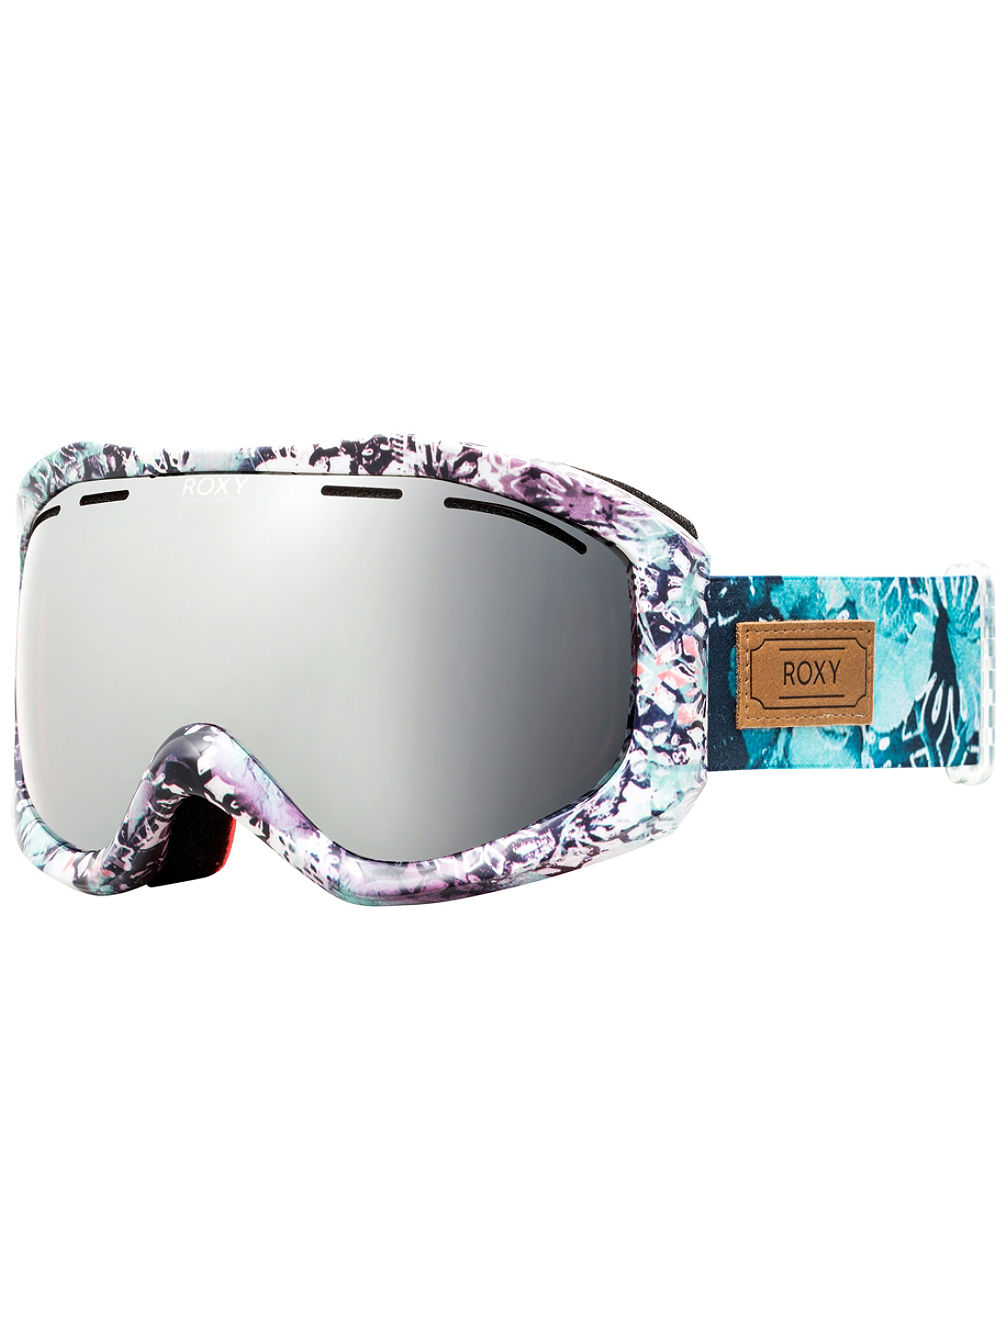 087a008529b Buy Roxy Sunset Art Series Aruba Blue Kaleidos Fl online at Blue Tomato